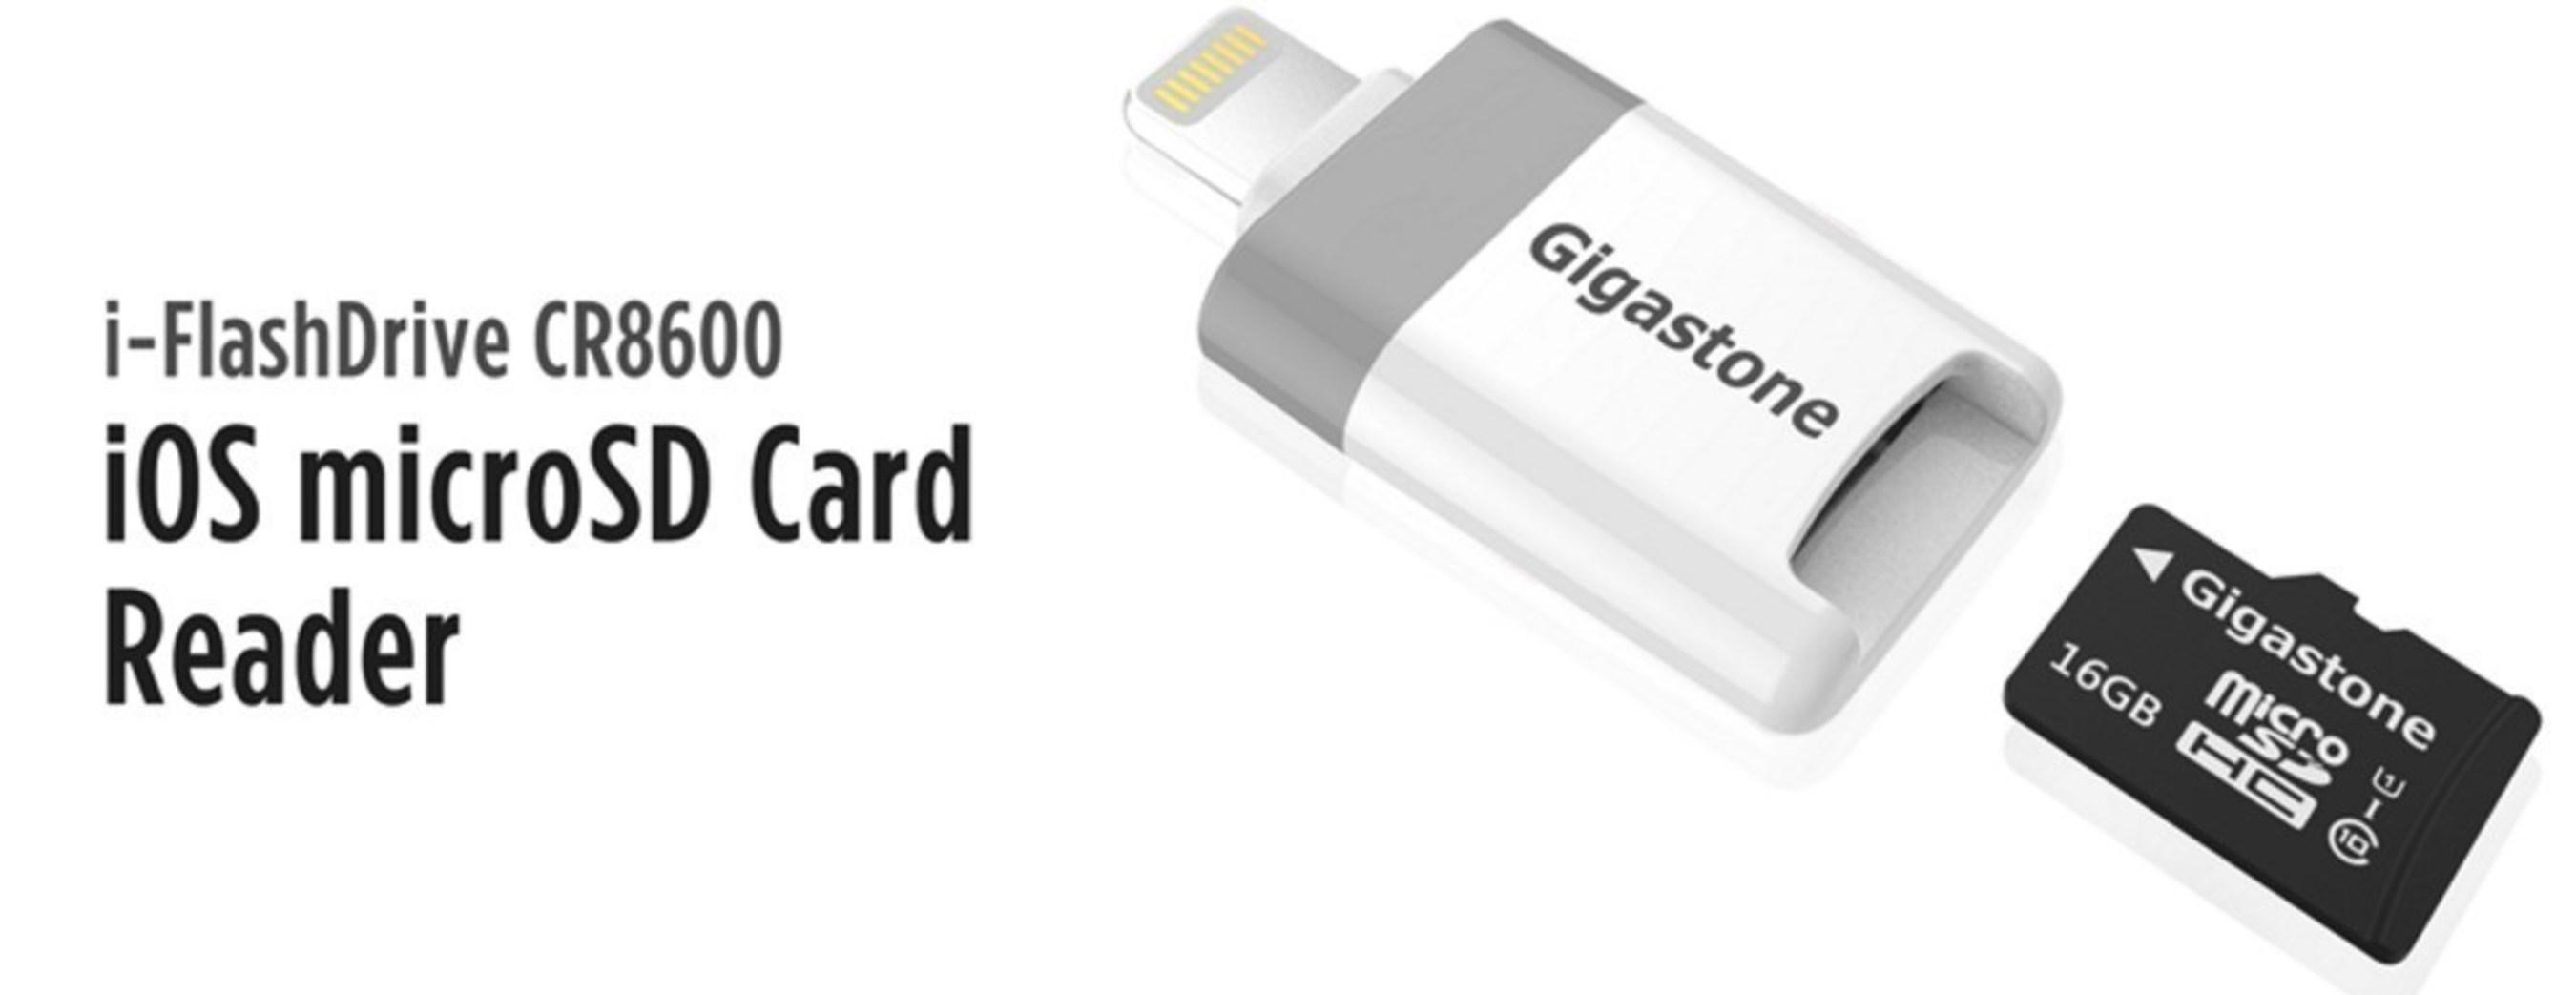 Gigastone iPhone Flash Drive that takes external Micro SD Card Memory